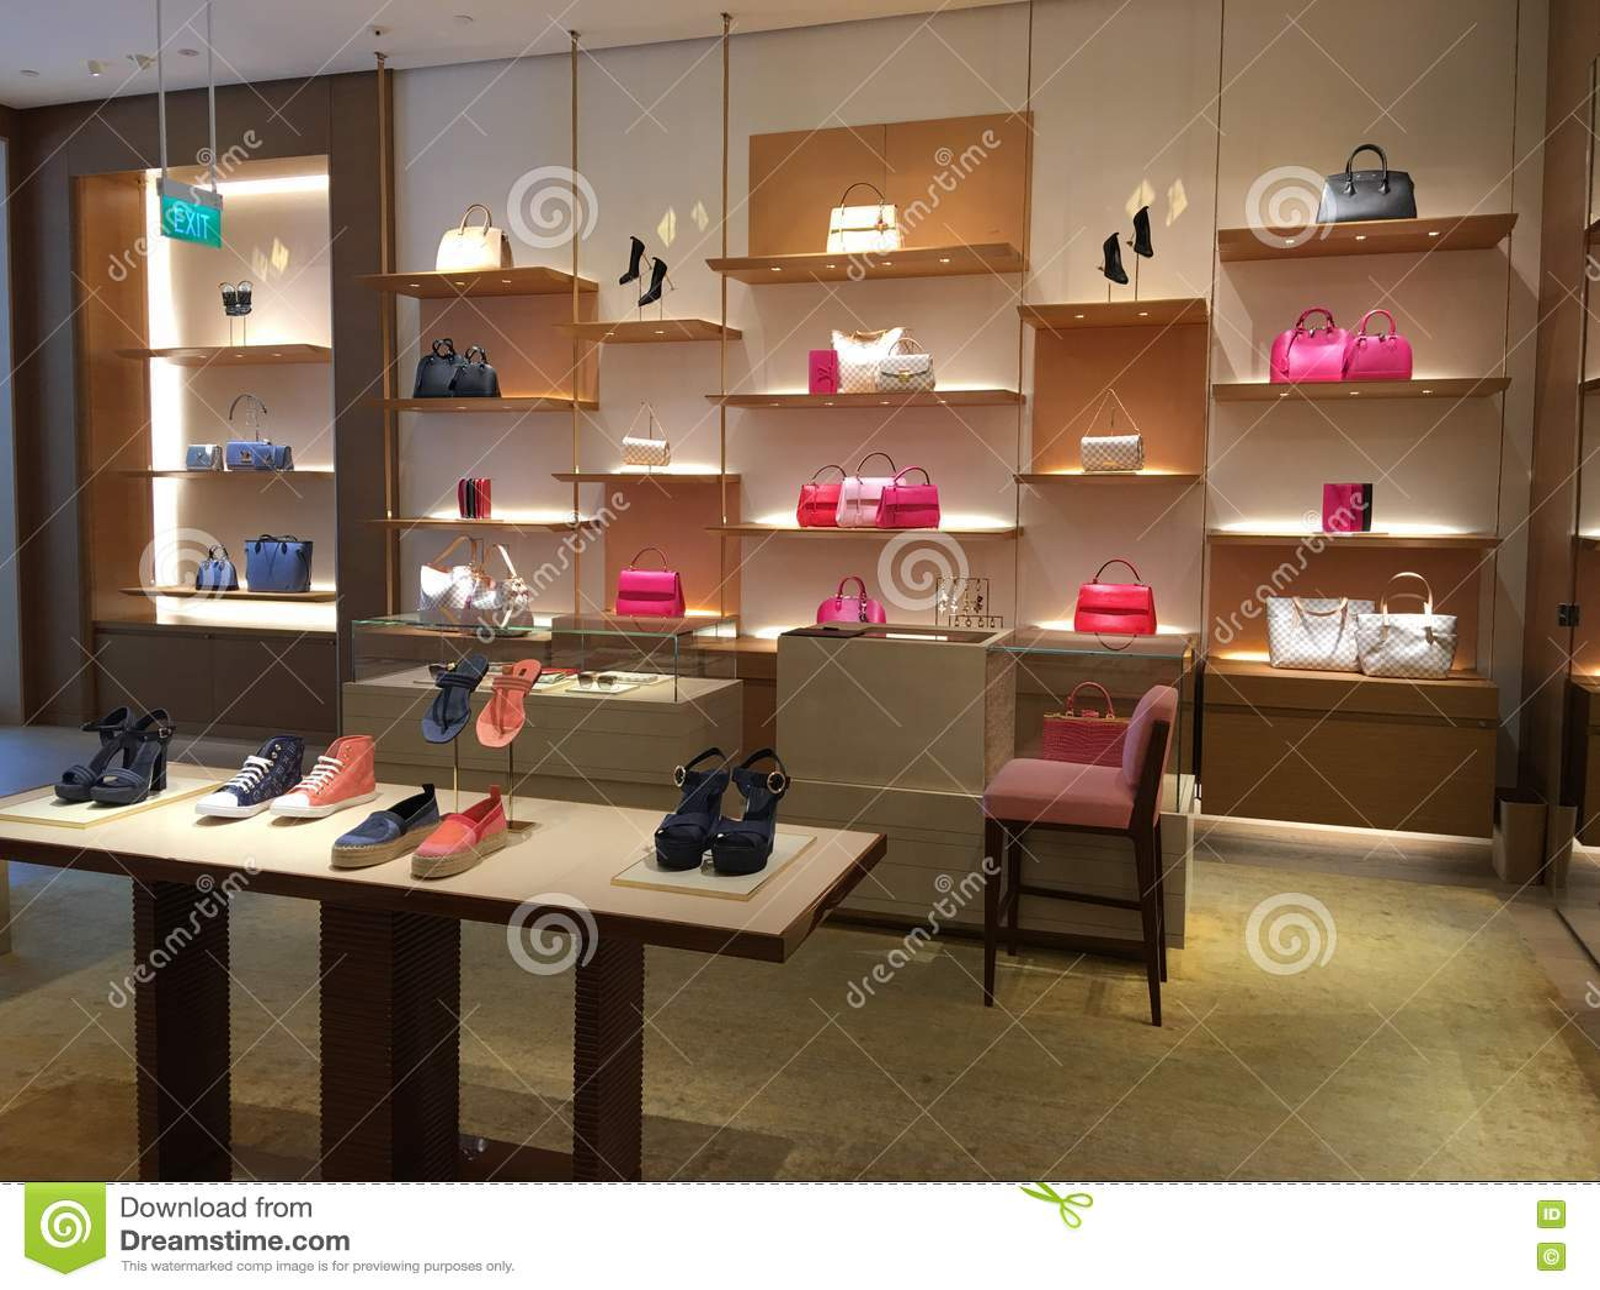 Louis Vuitton Shop Interior Display